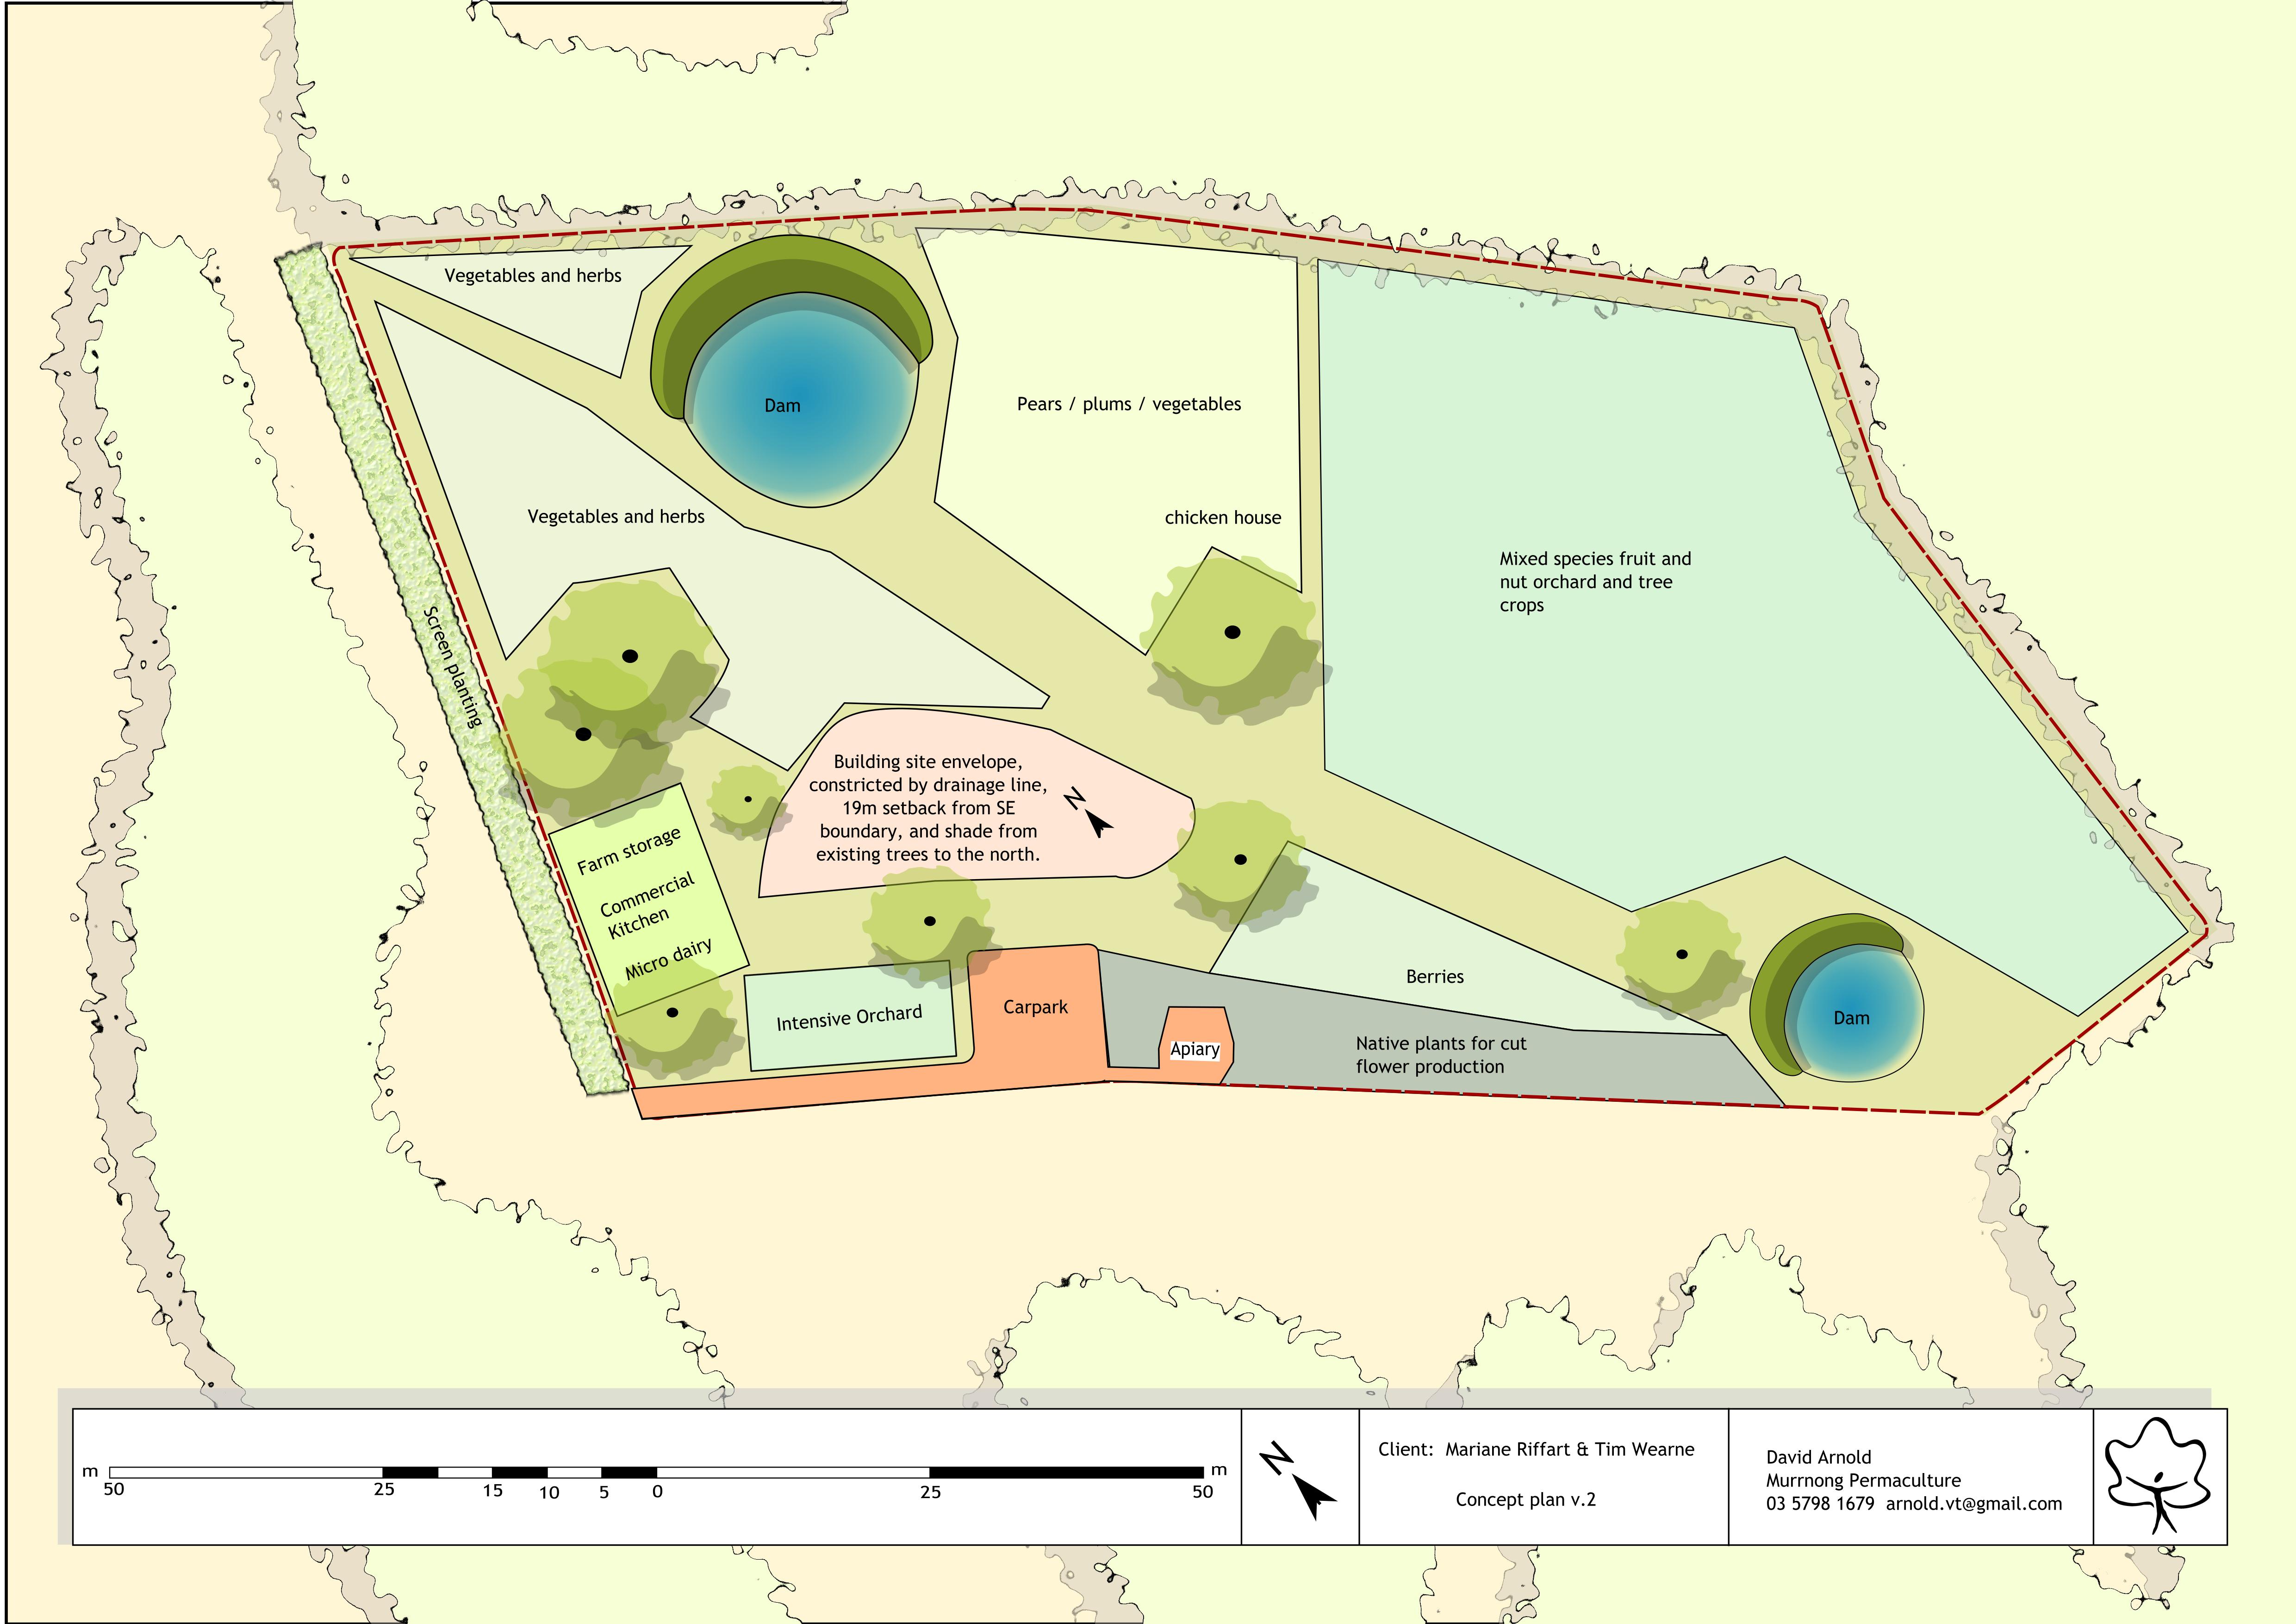 Riffart concept plan v2